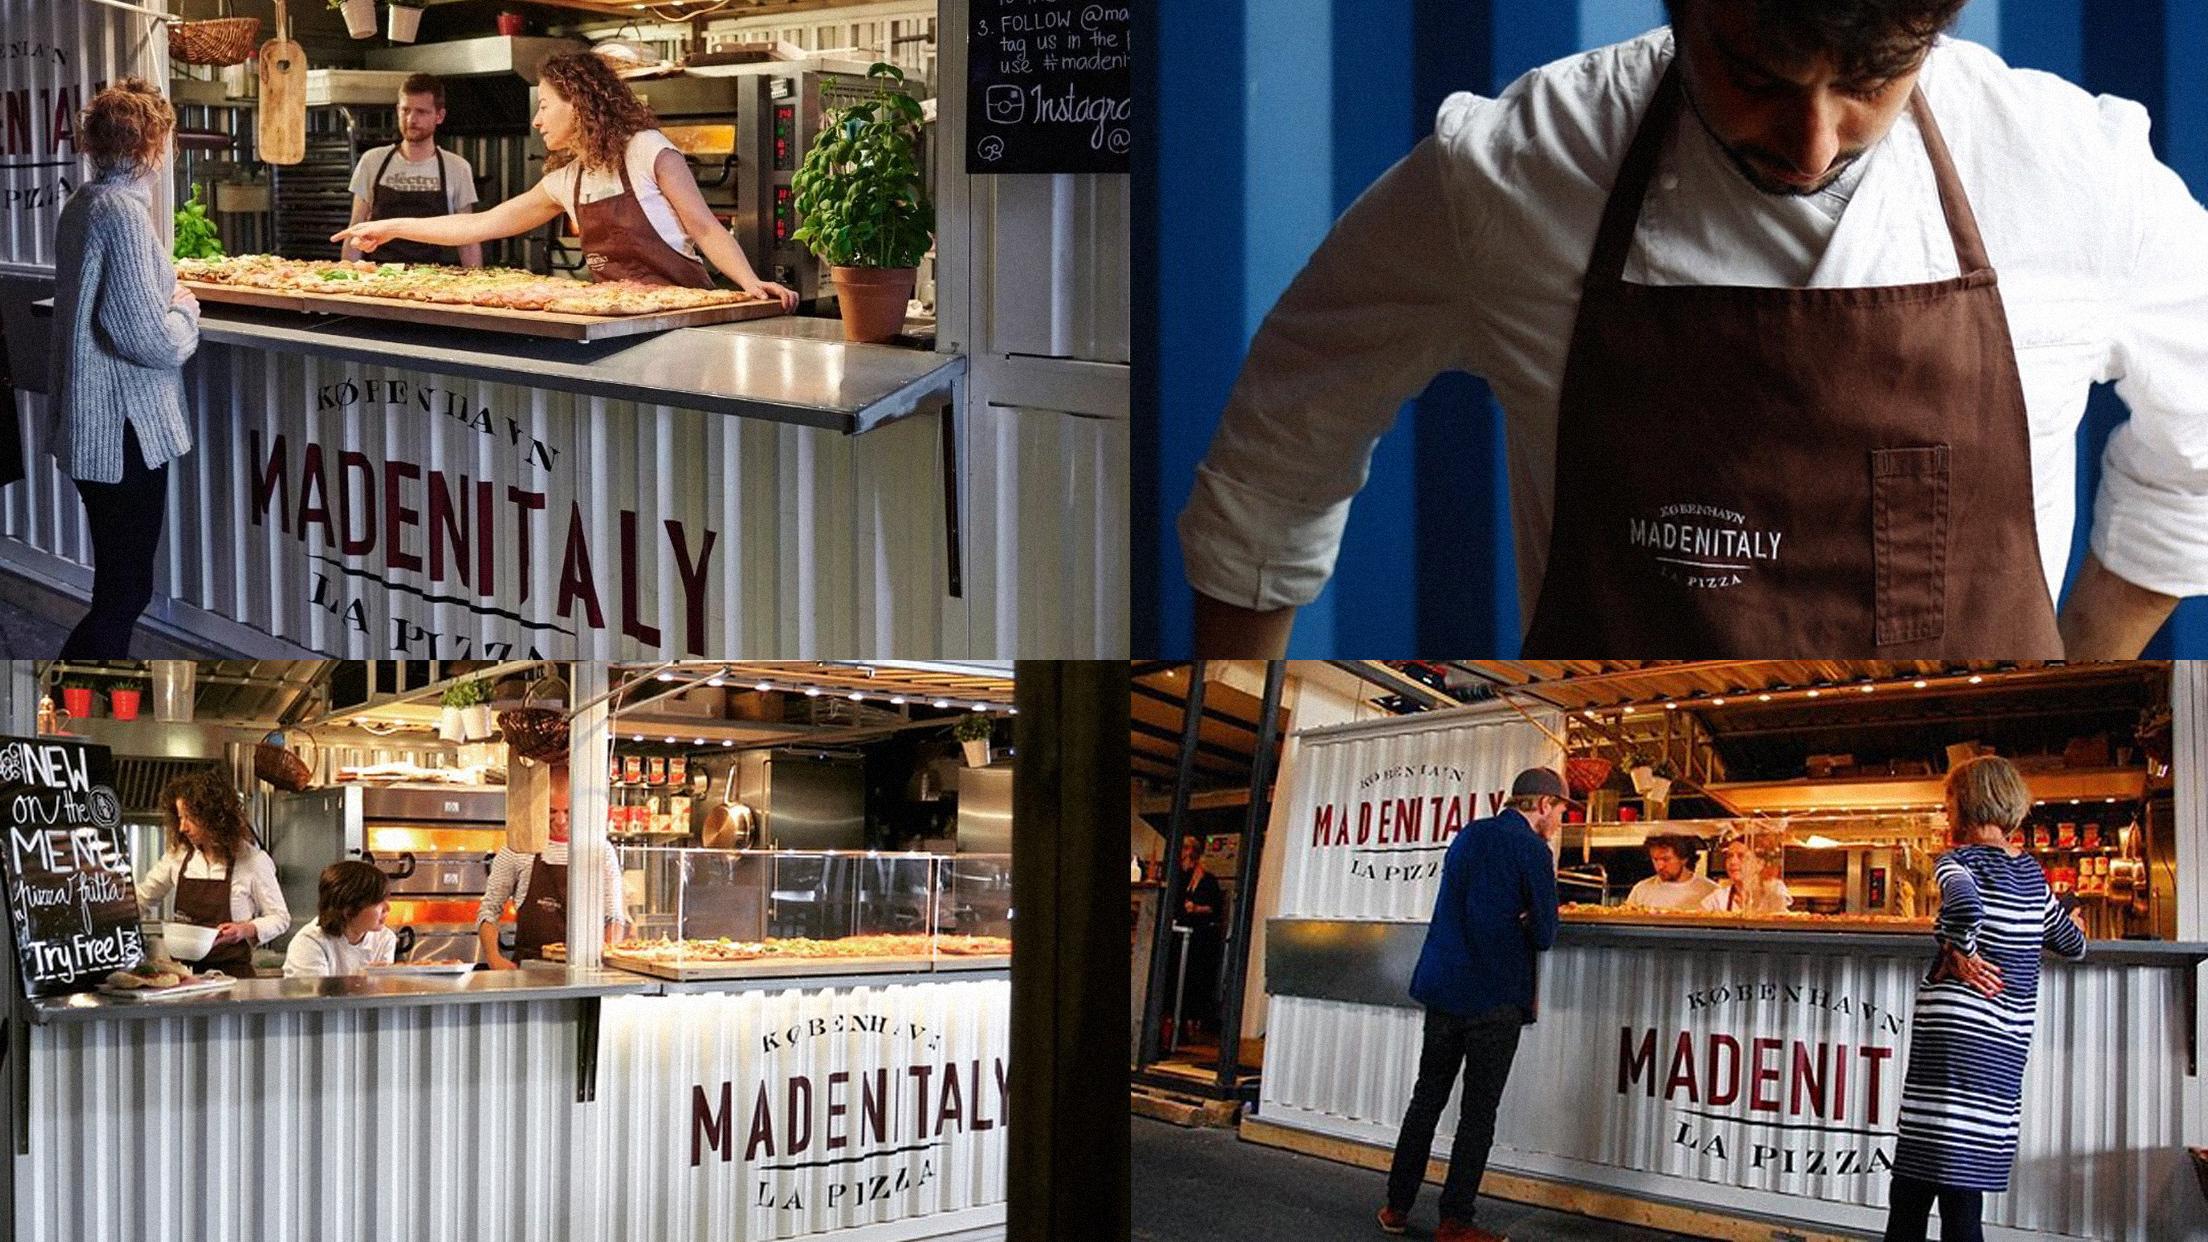 MADENITALY - Copenhagen Street Food